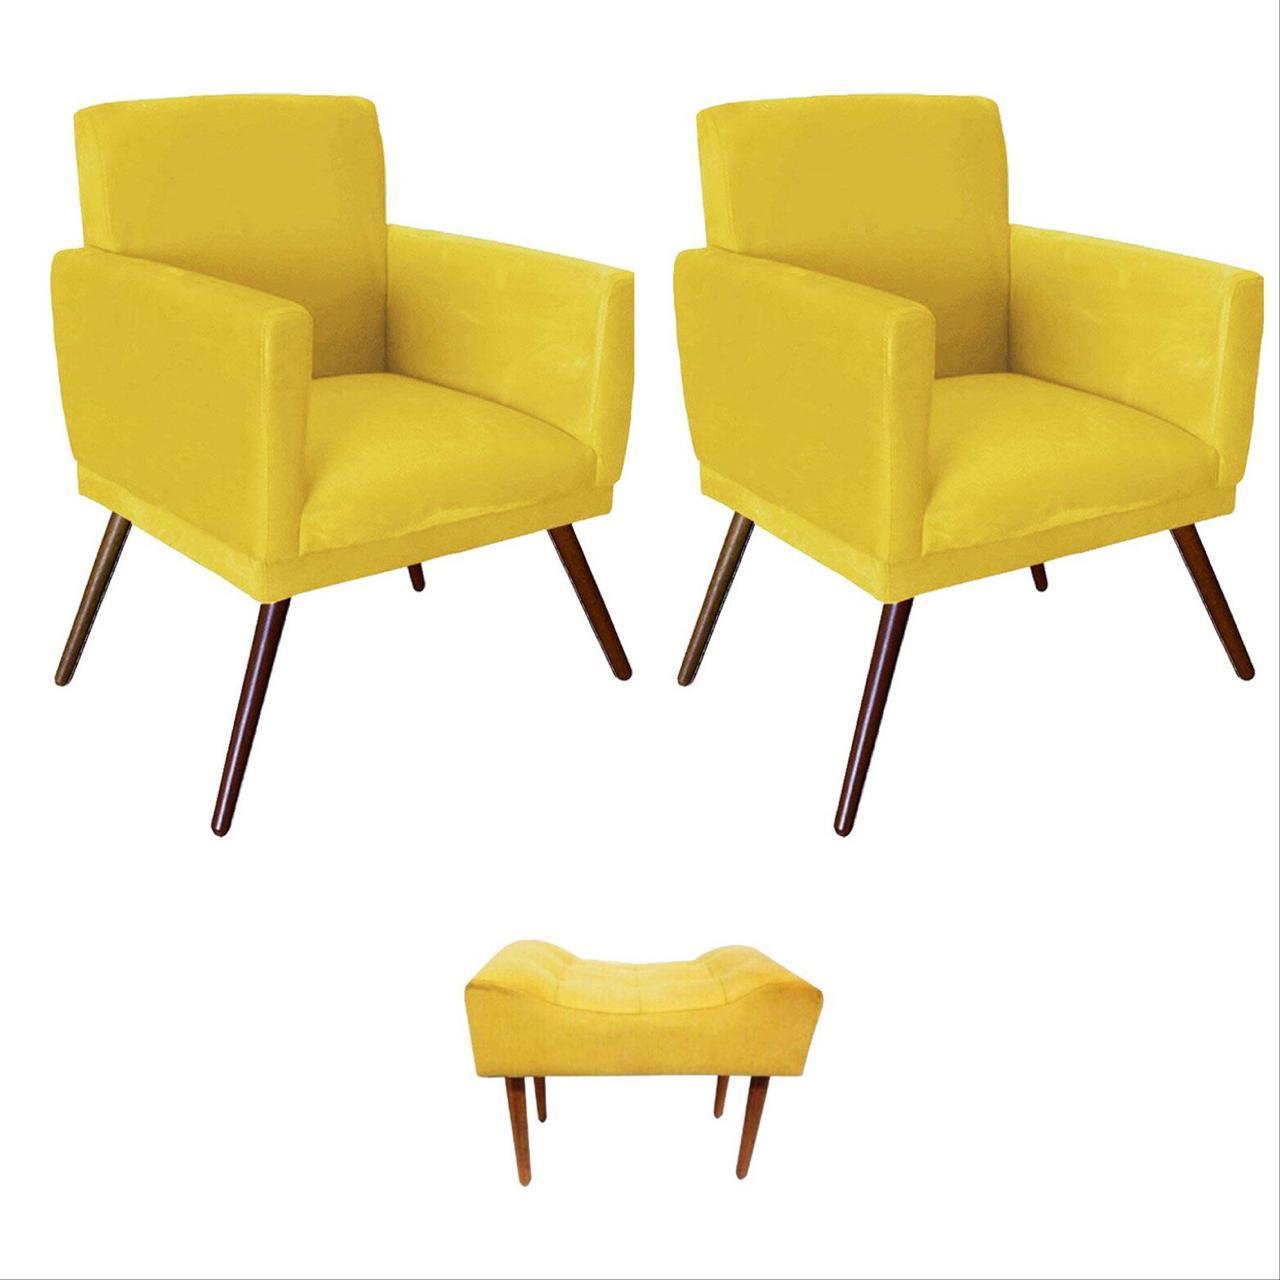 Kit 02 Poltrona Decorativa Nina com rodapé e Puff retangular Amarelo